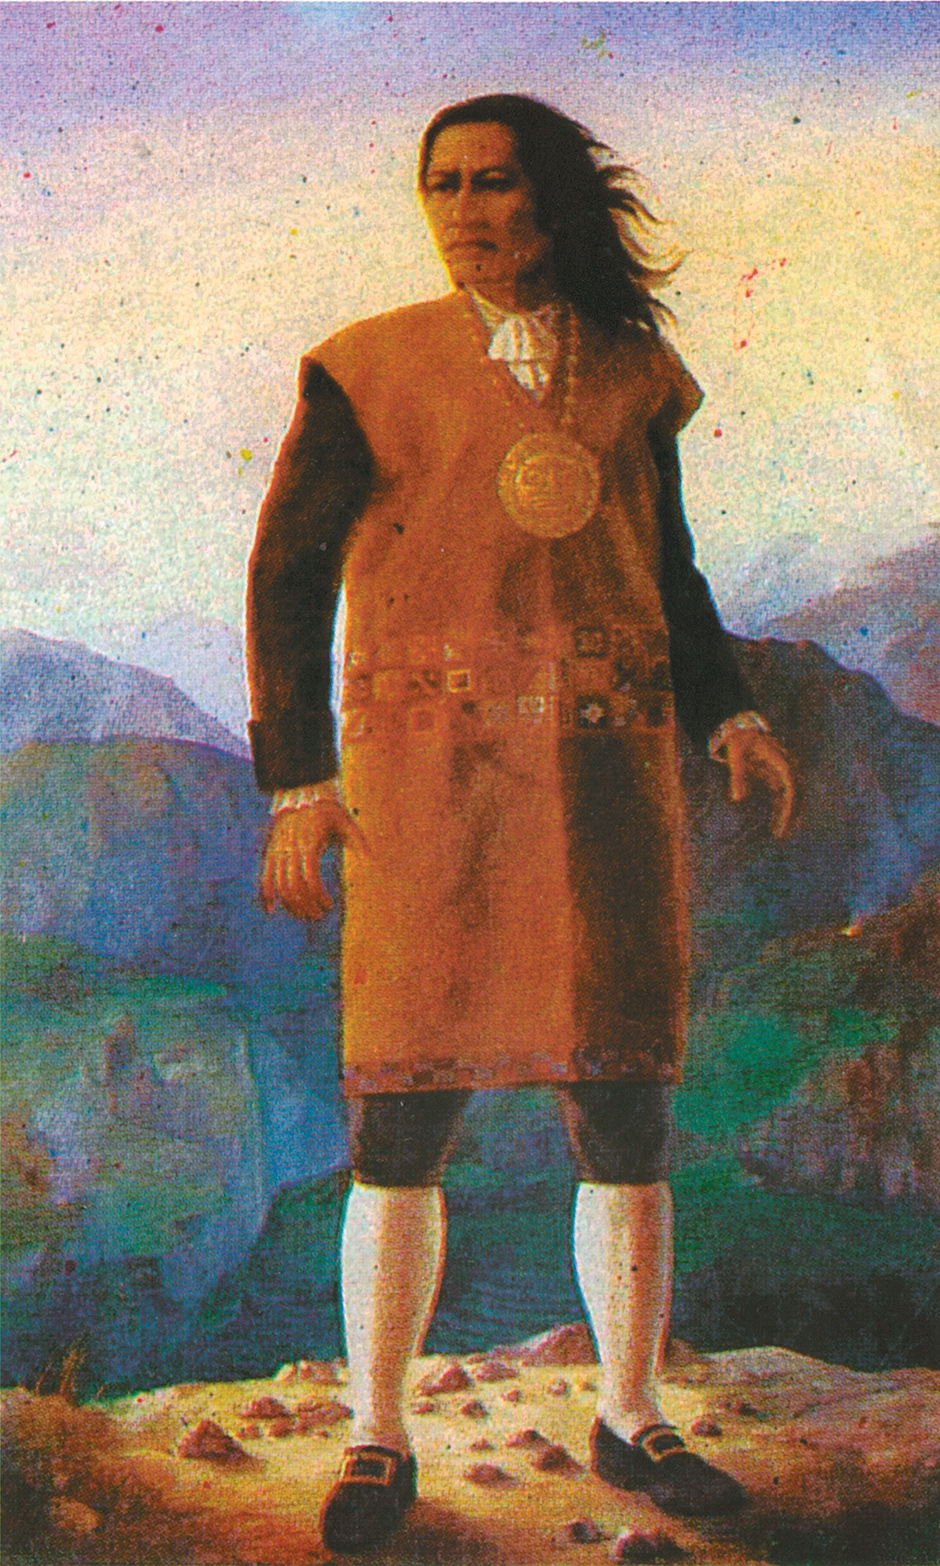 Tupac Amaru II, the late-eighteenth-century leader of the Peruvian rebellion against the Spanish crown